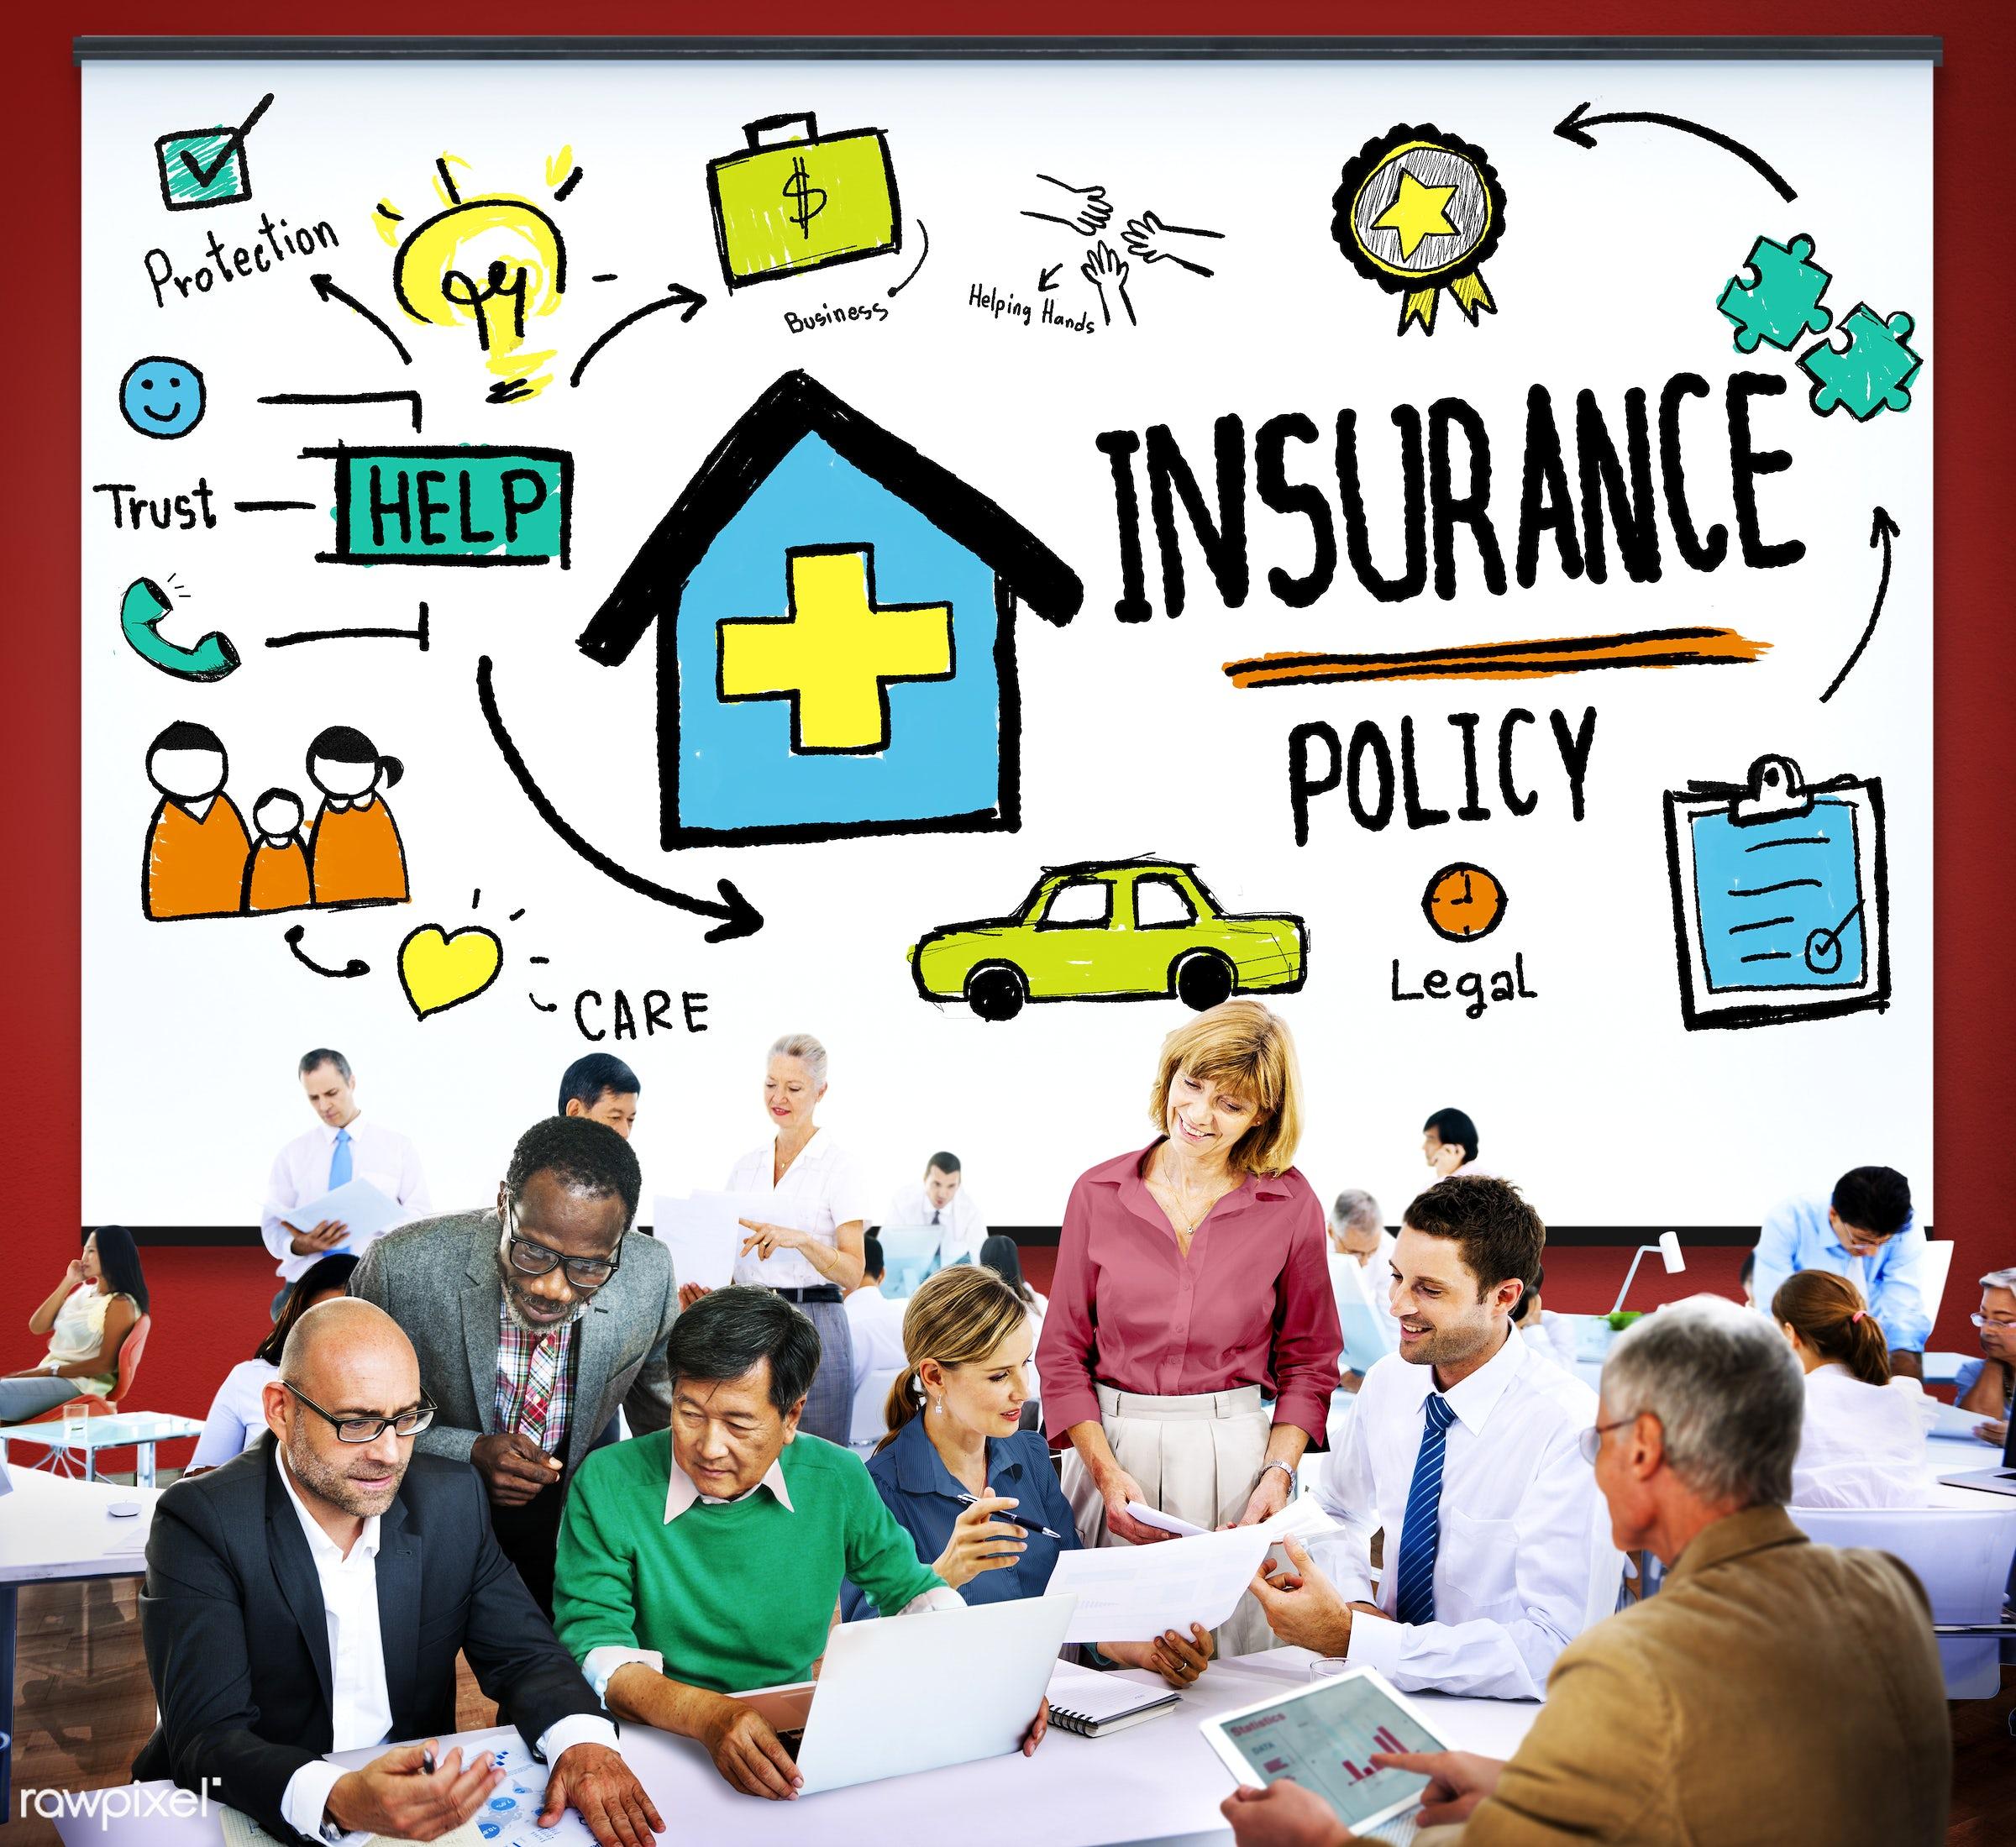 accident insurance, analysis, benefits, business, business people, businessmen, businesswomen, busy, car insurance,...